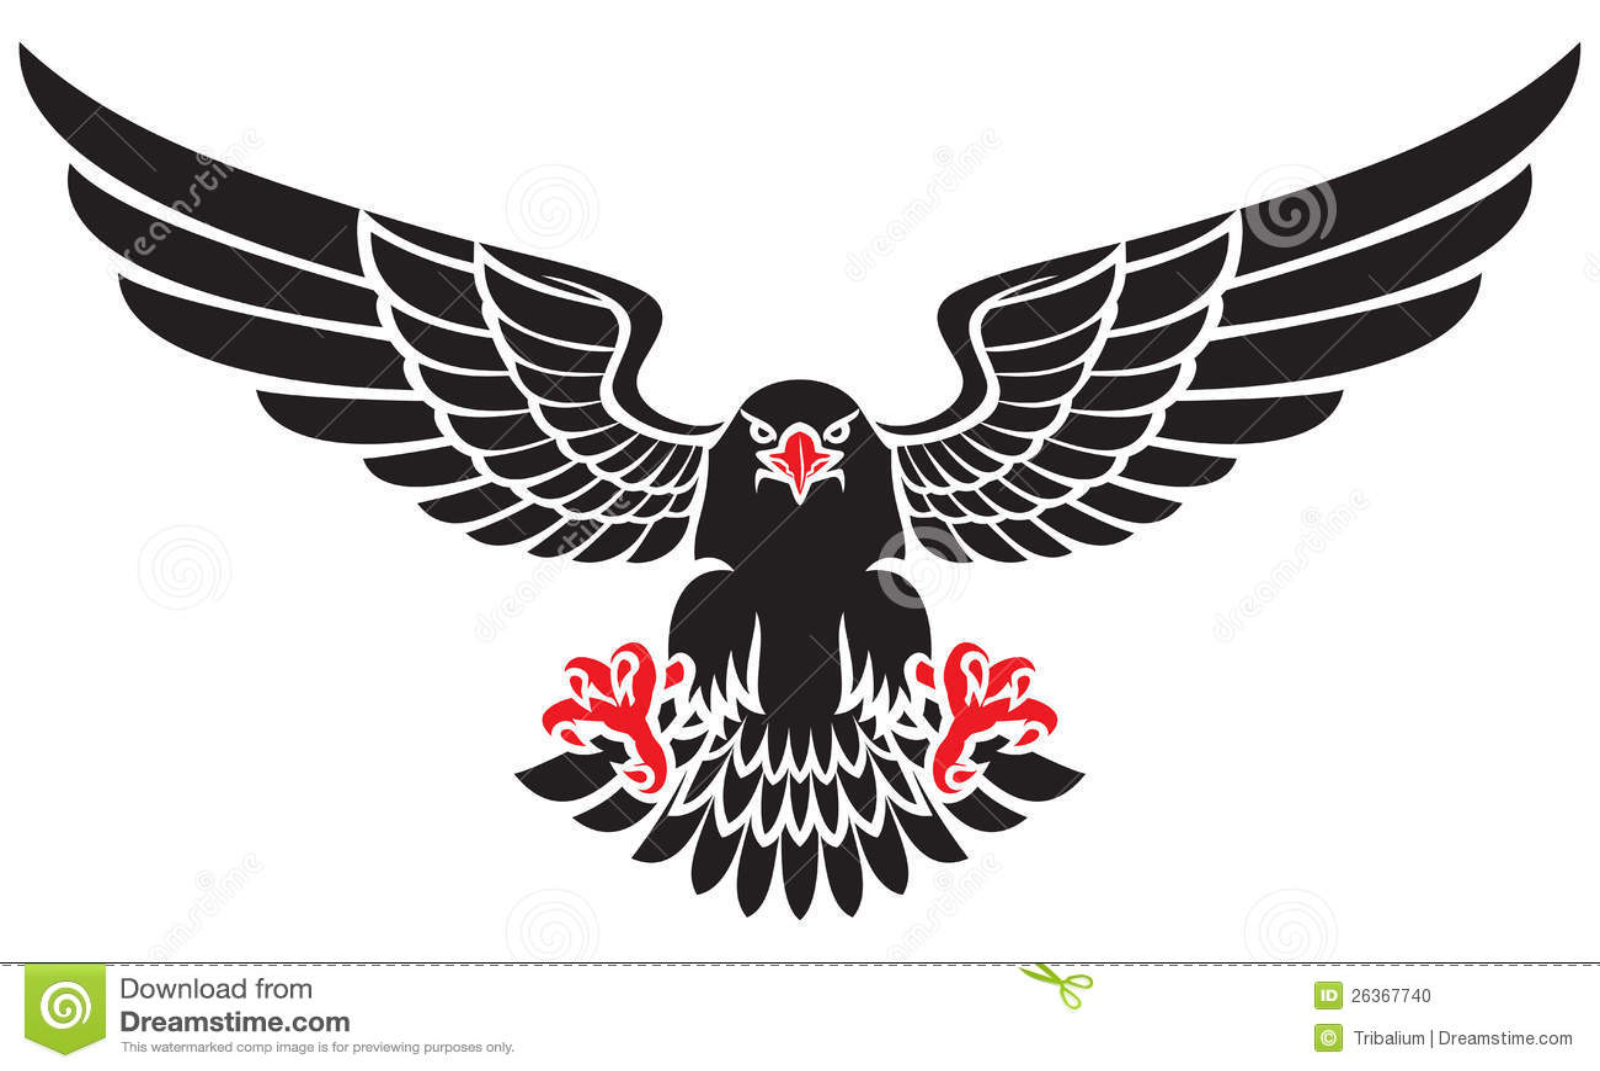 German eagle symbol - photo#21